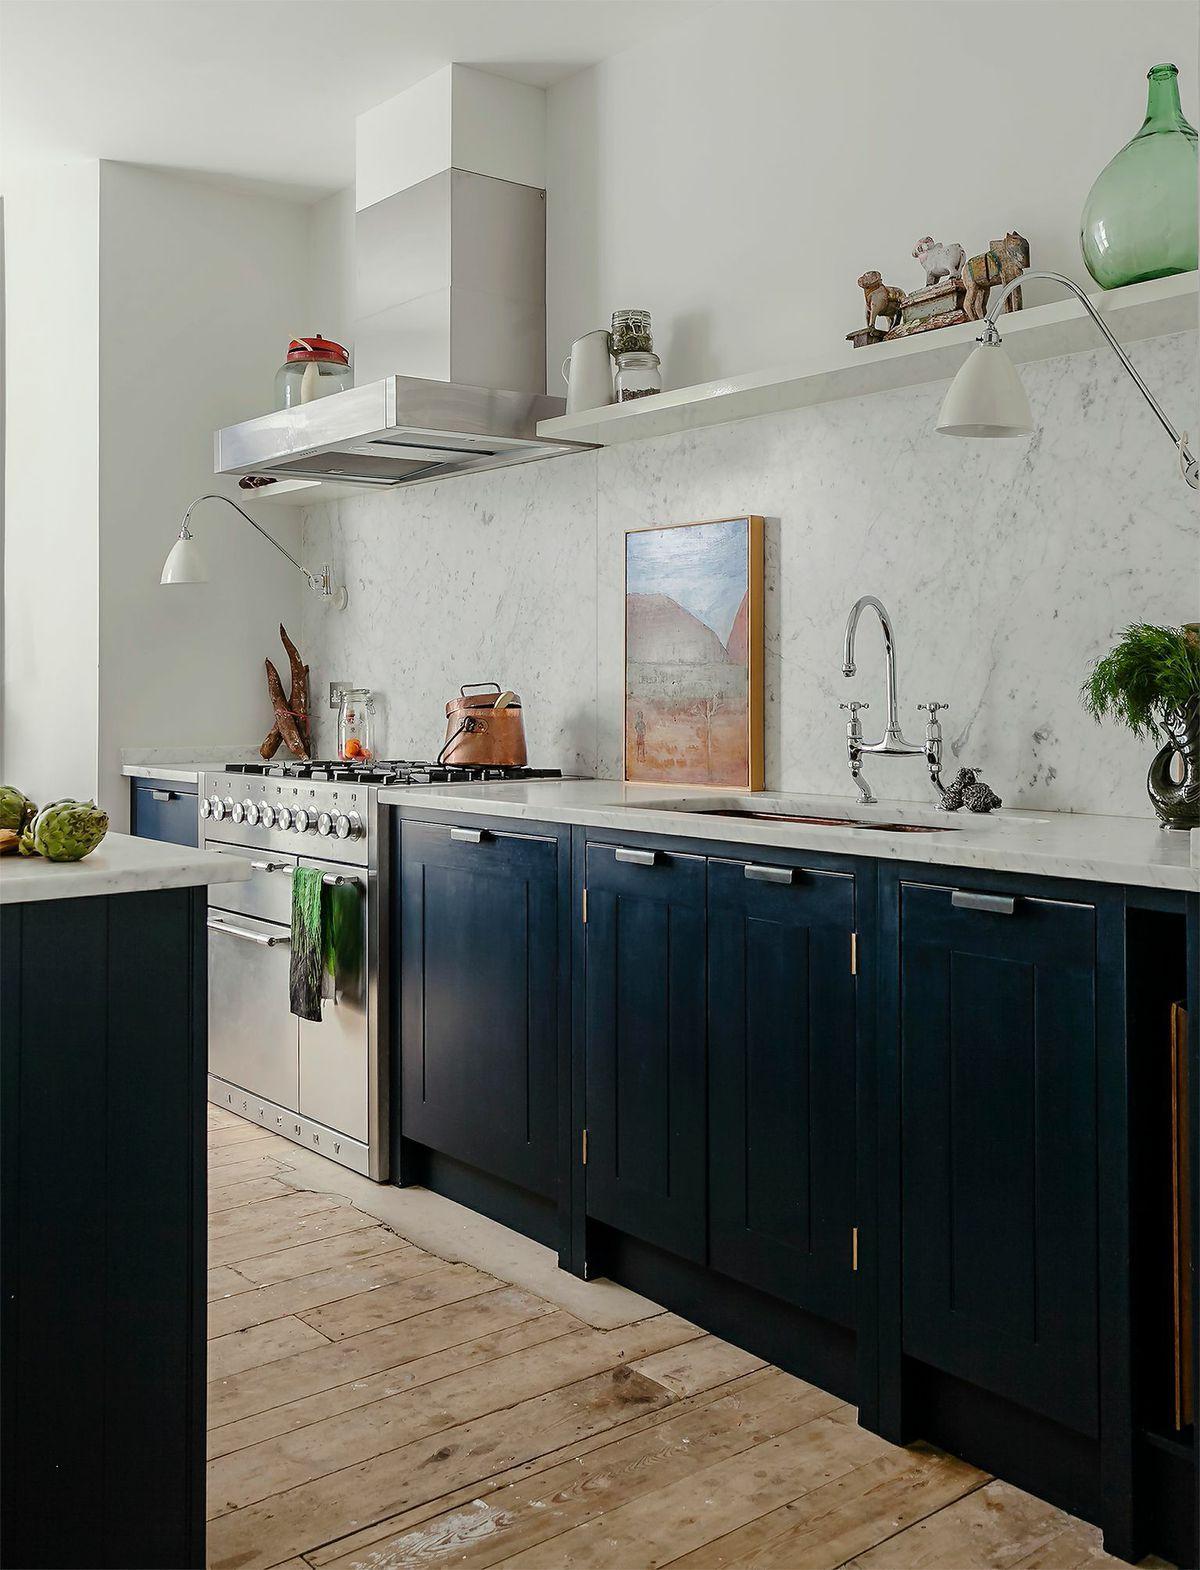 In the kitchen with skye gyngell londonus chef du jour kitchens